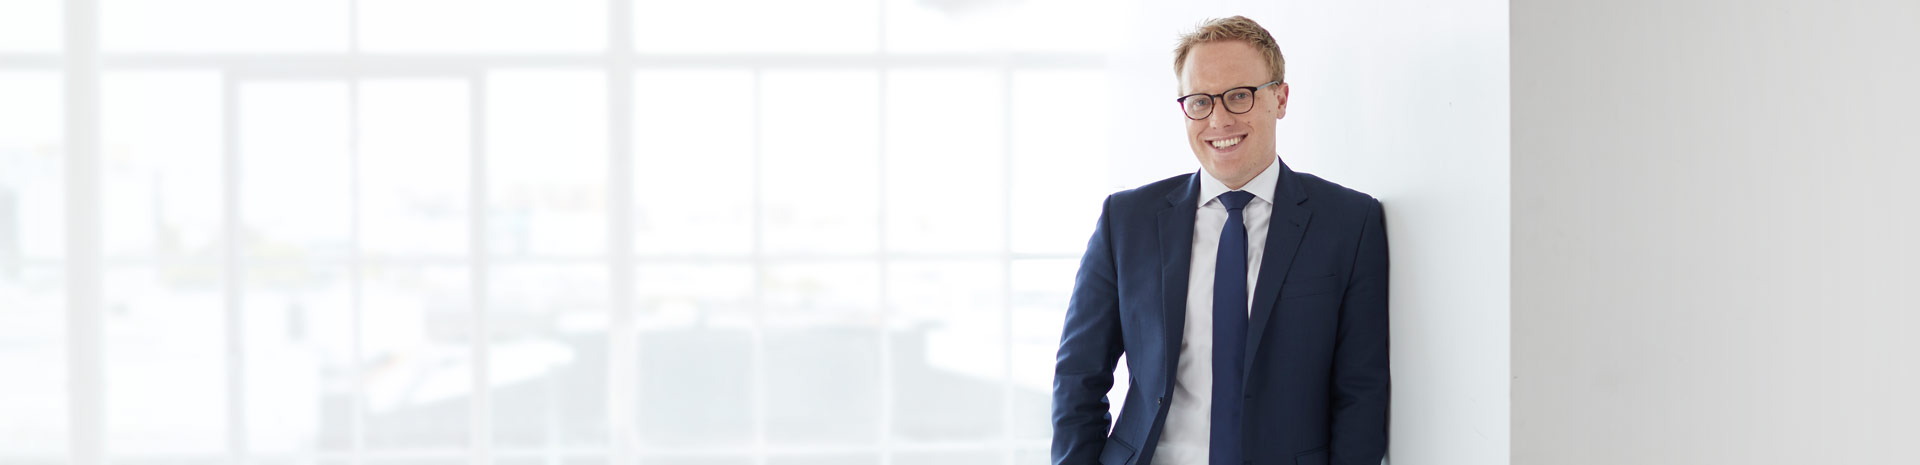 Corporate partner Ian Beaumont finalist for NZ Dealmaker of the Year Award